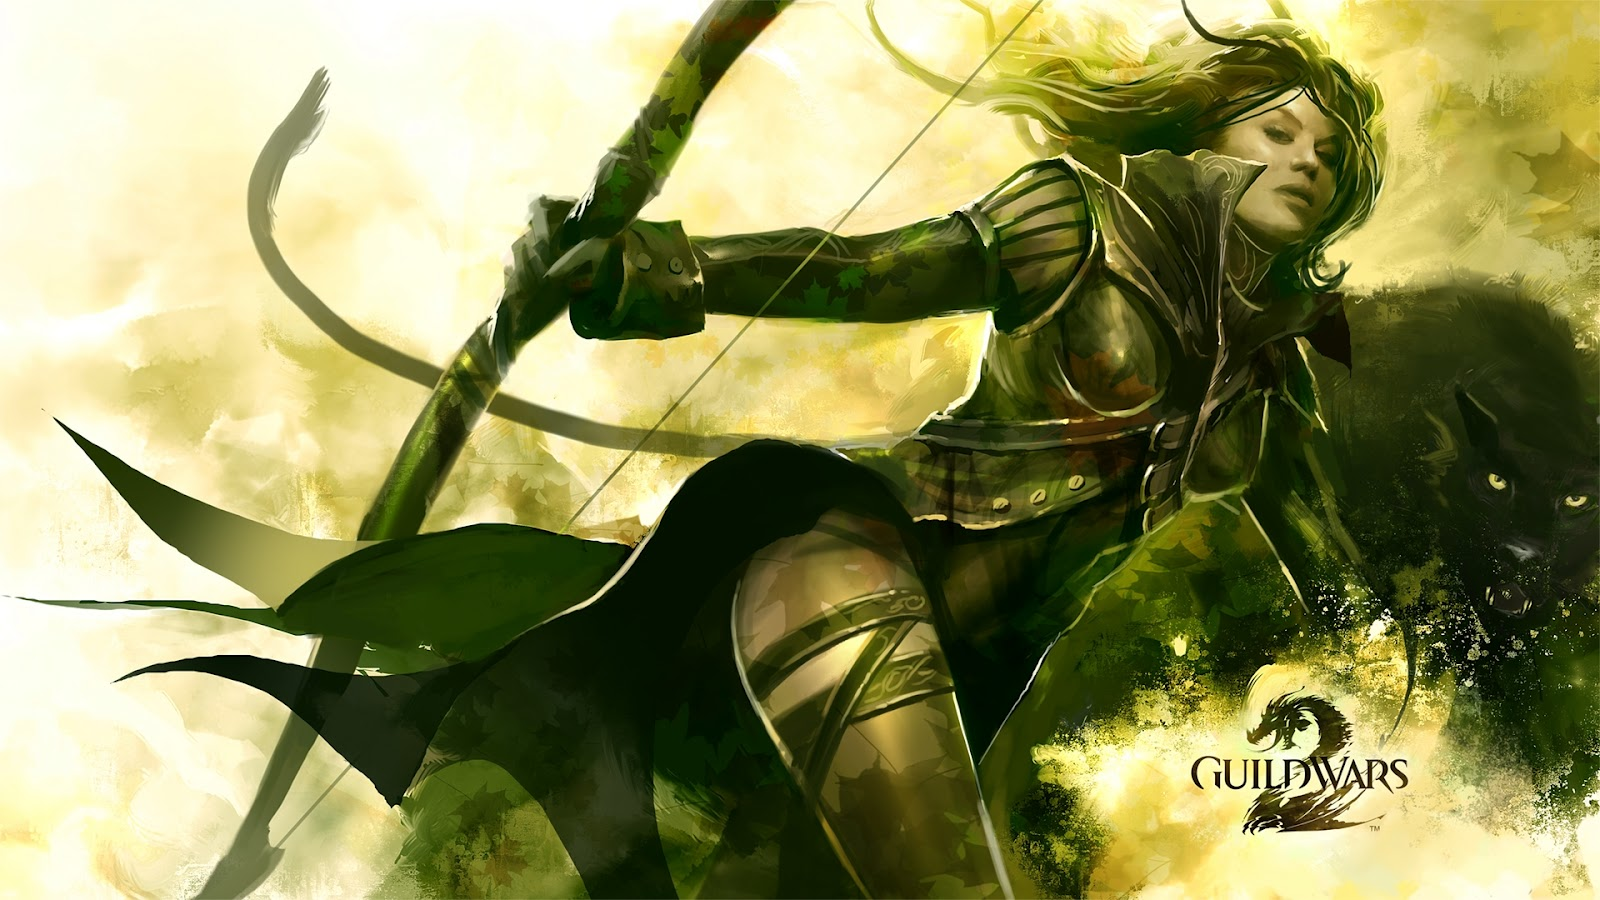 Forbidden Forest: Guild Wars 2 Wallpaper